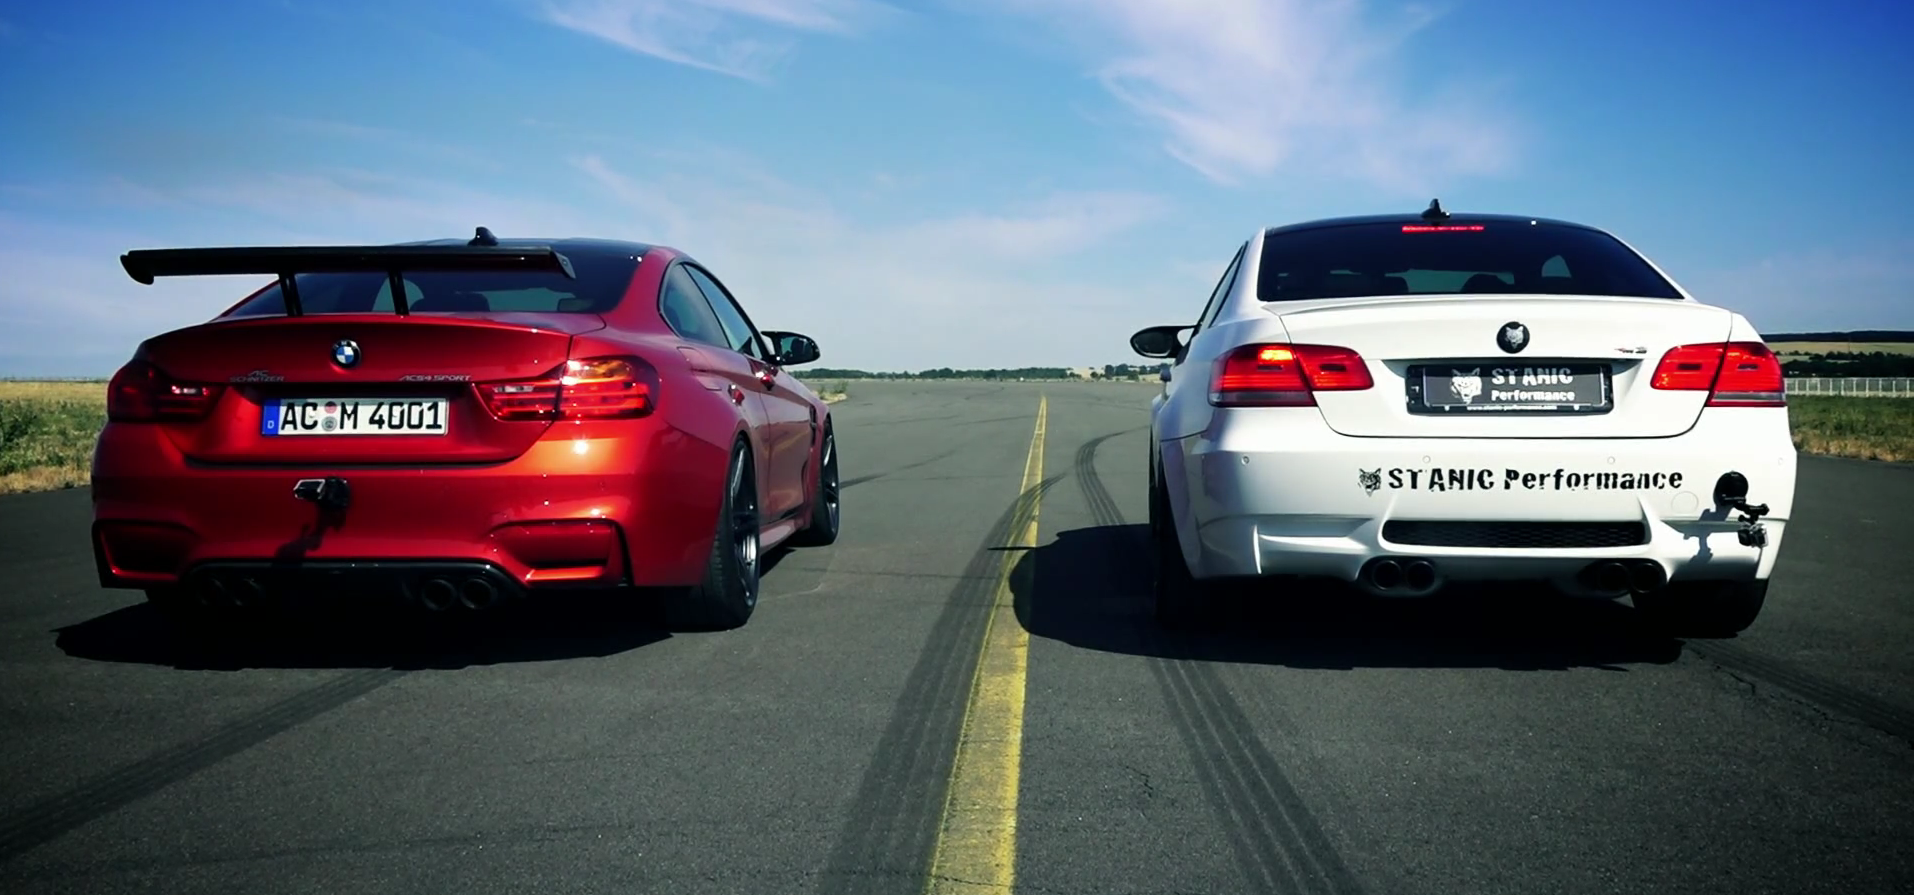 Eargasm BMW E92 M3 with Custom Exhaust Versus AC Schnitzer BMW M4